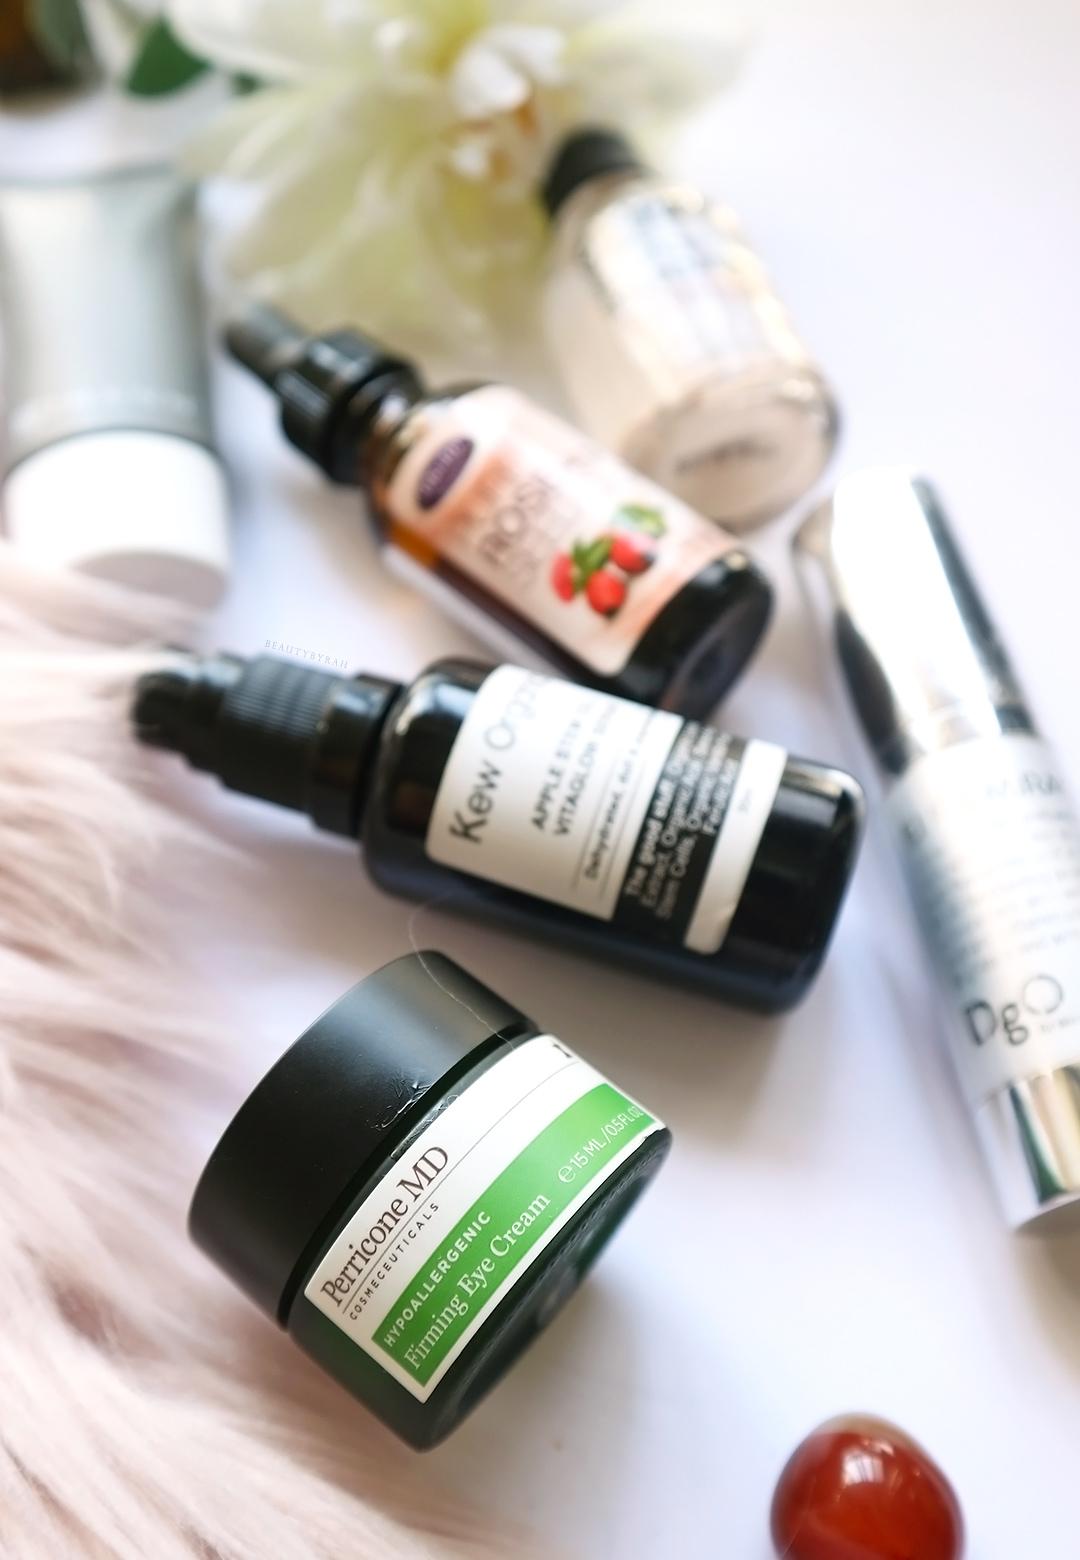 Perricone MD Firming Eye Cream and Kew Organics Apple Stem Vita Glow Serum Review